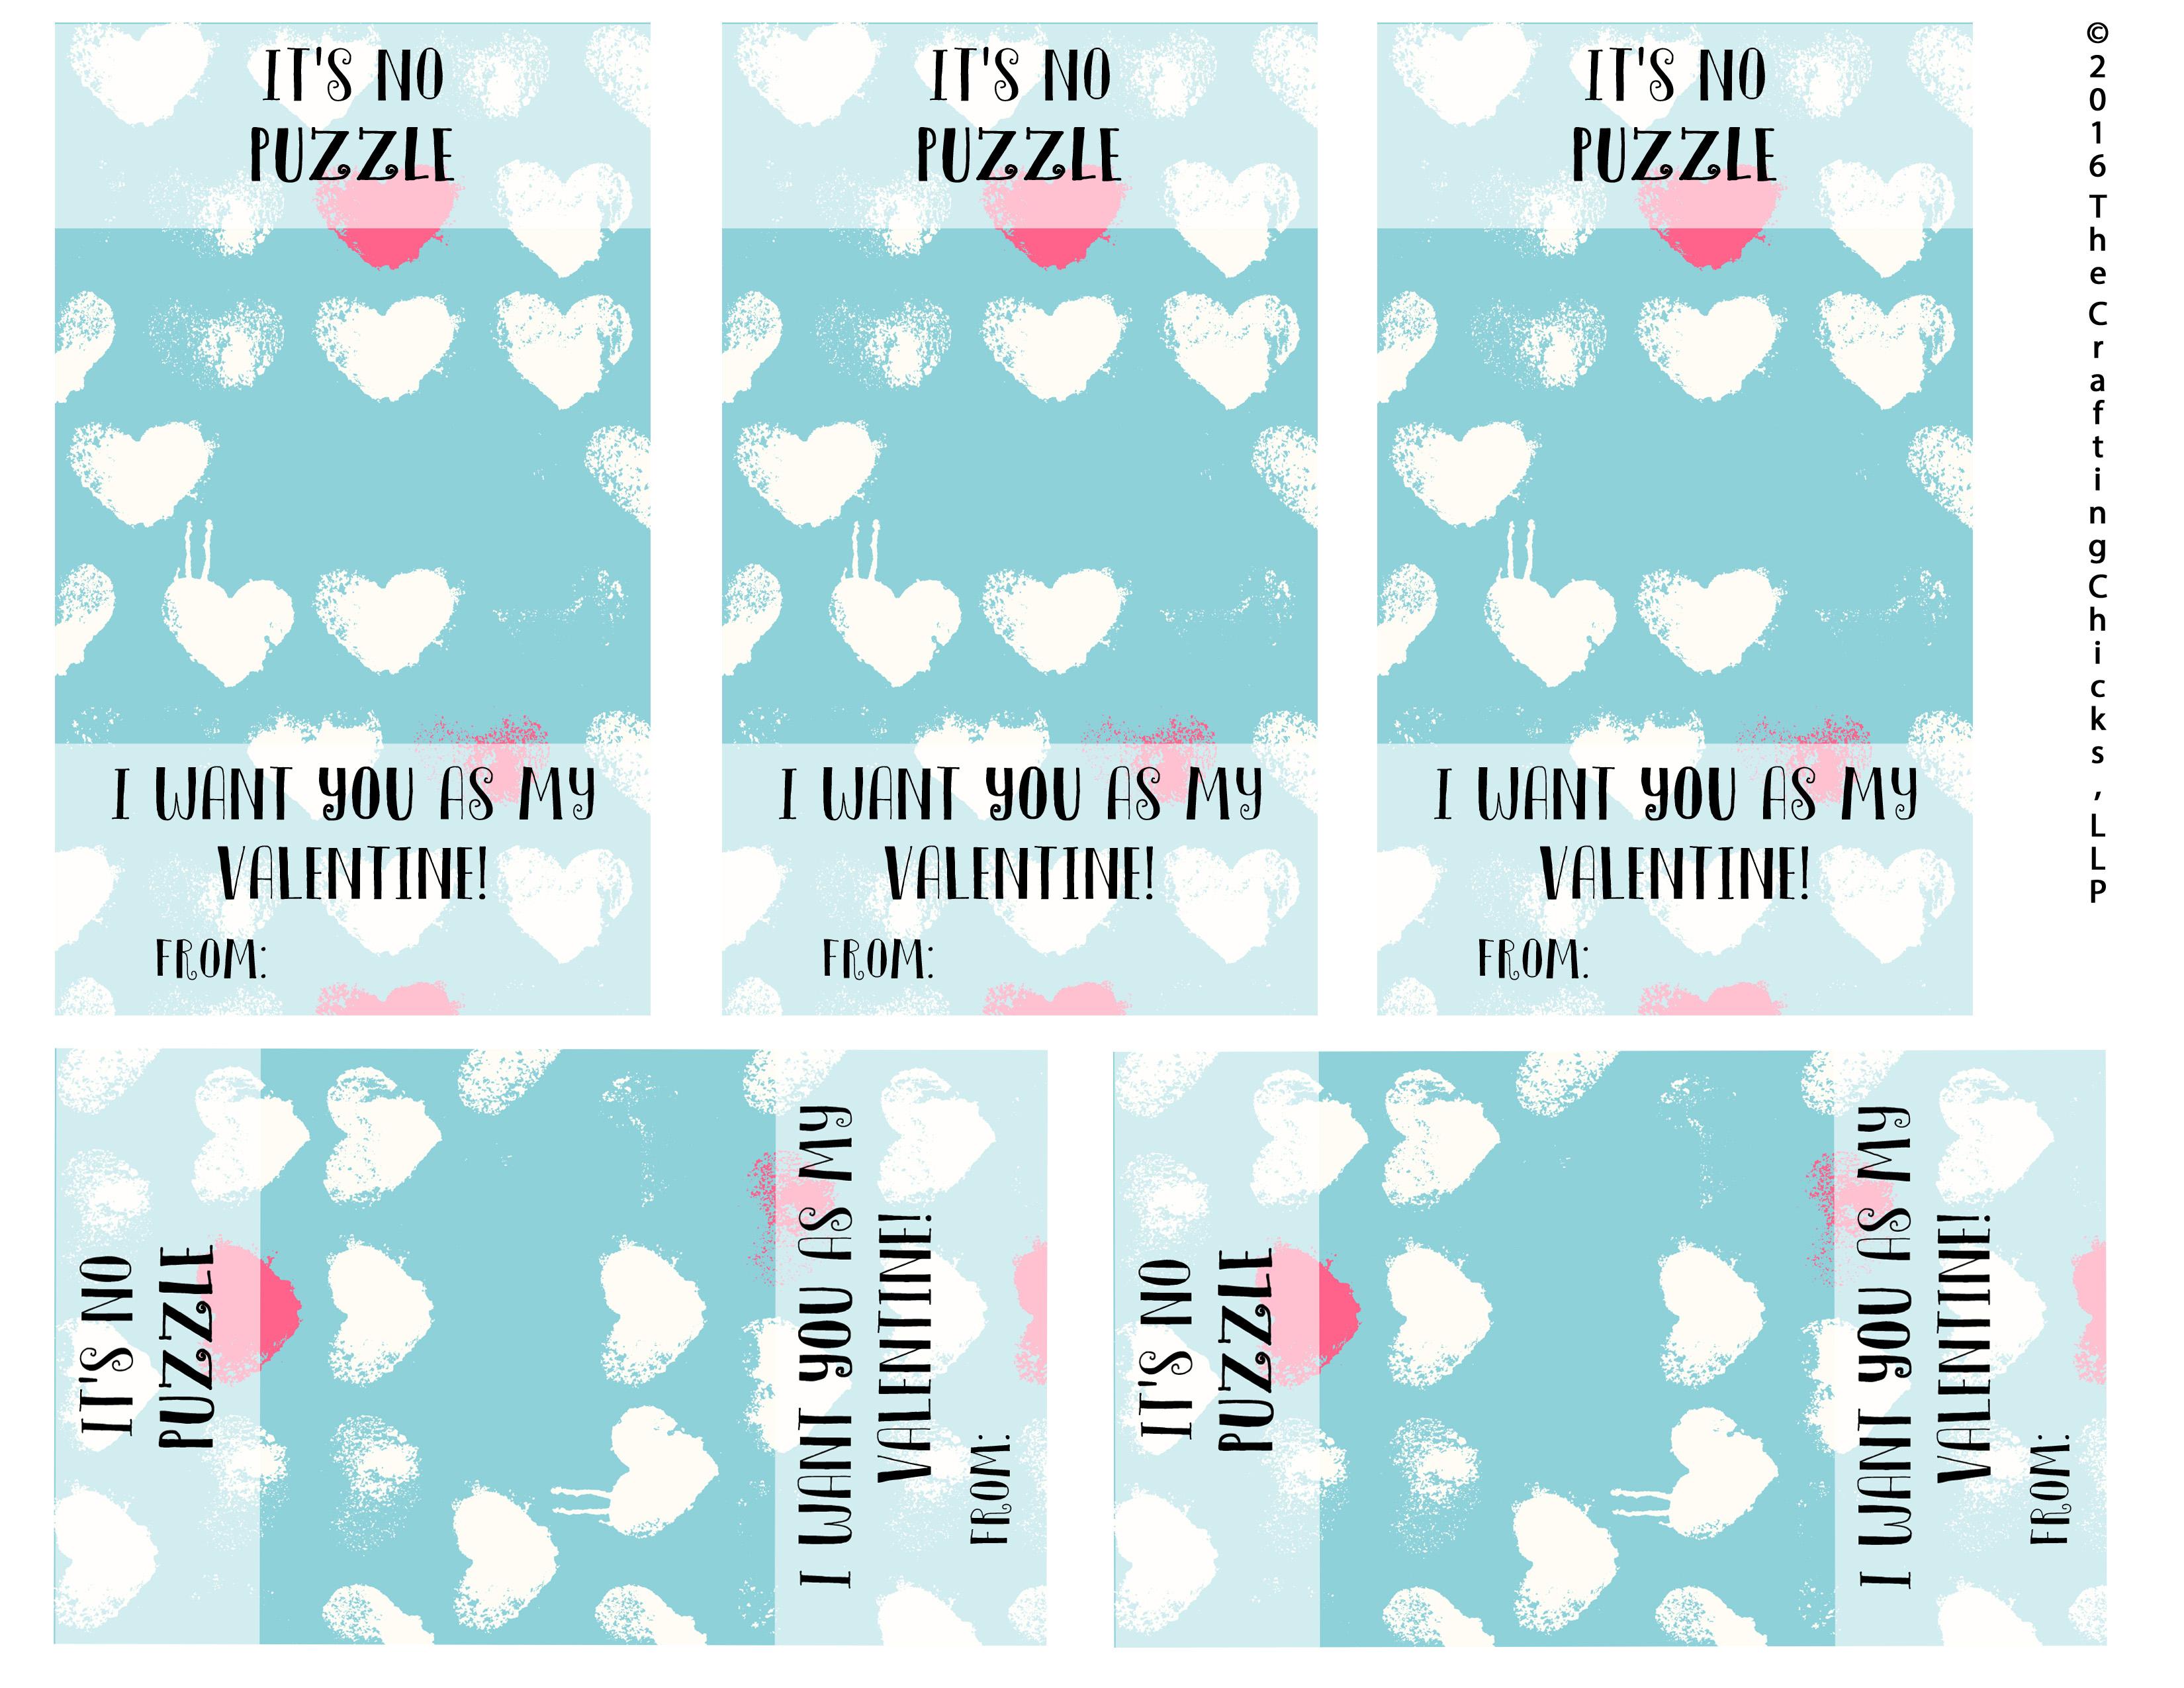 It's No Puzzle Valentines Printables - The Crafting Chicks - Printable Valentine Puzzles